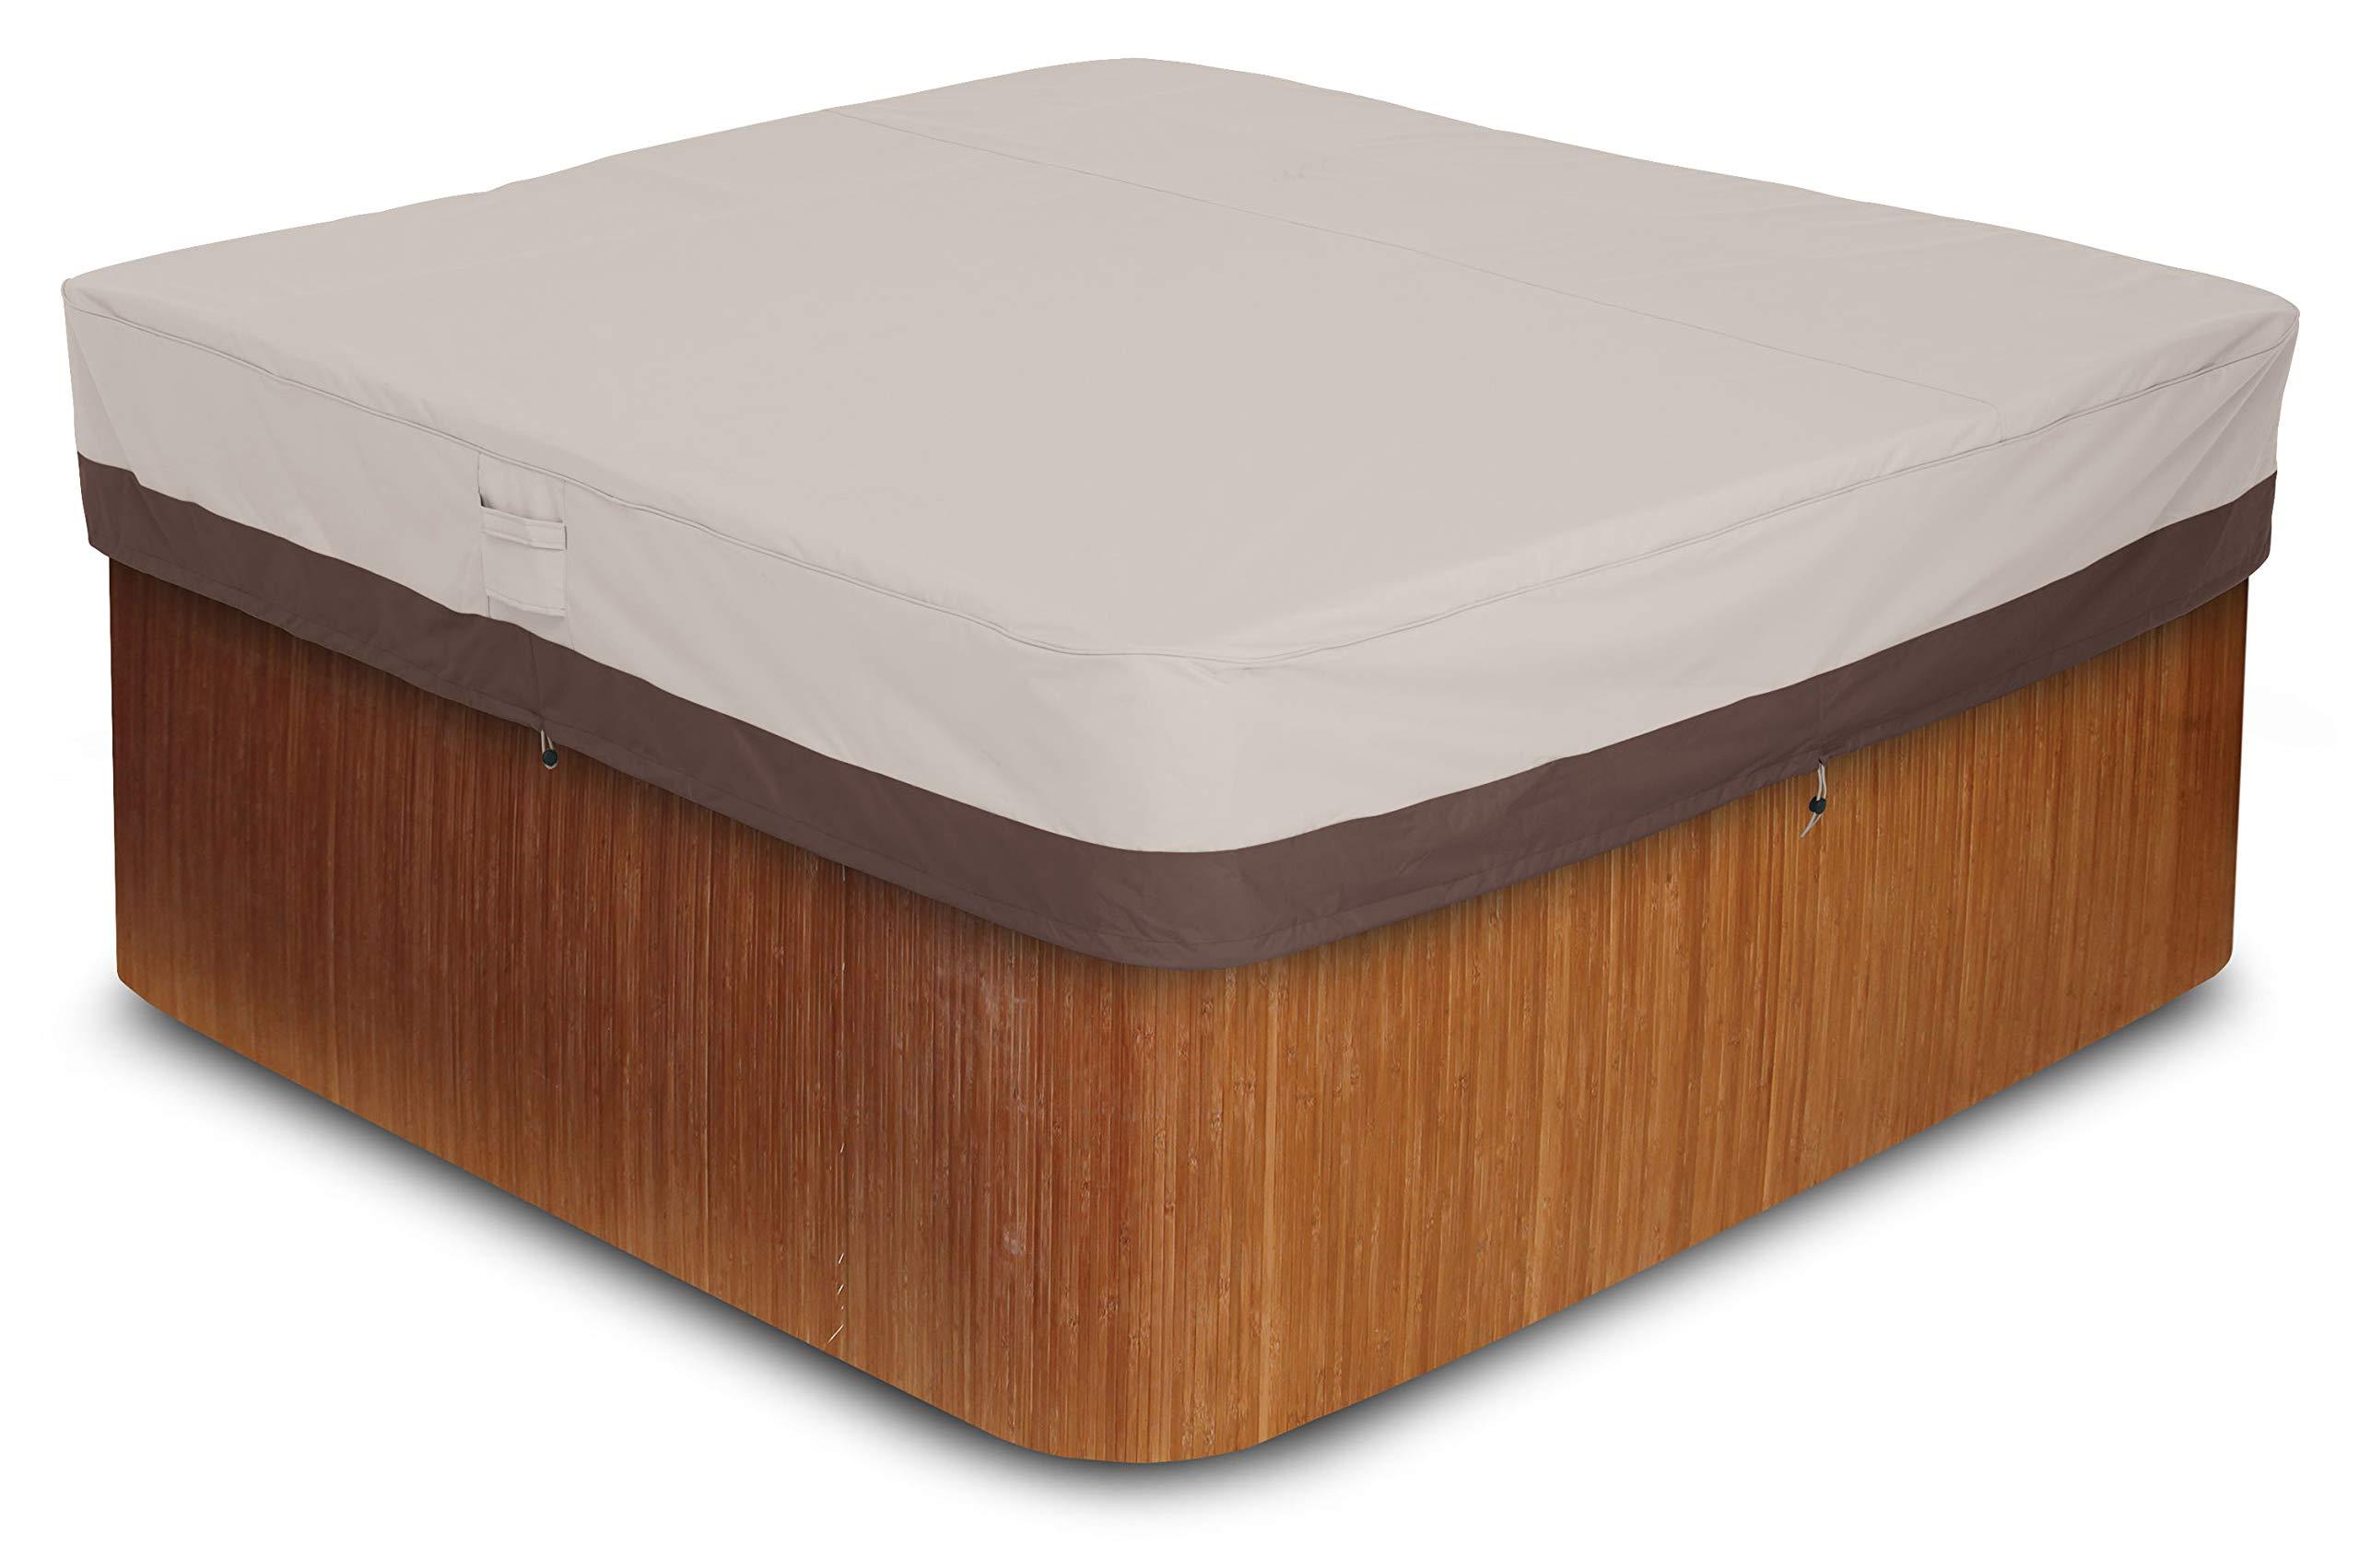 AmazonBasics Outdoor Square Hot Tub Cover, Medium